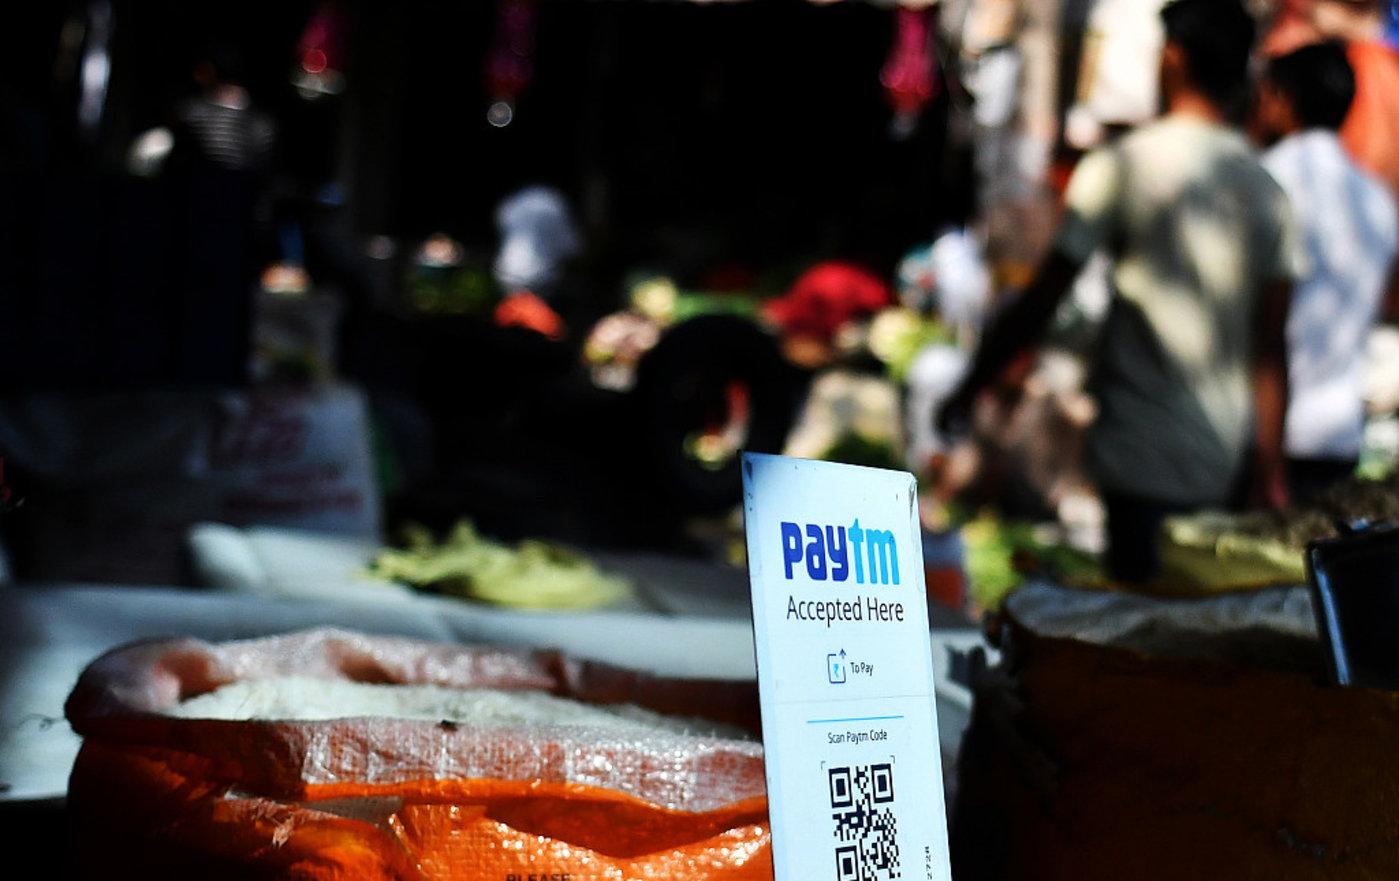 Paytm in India